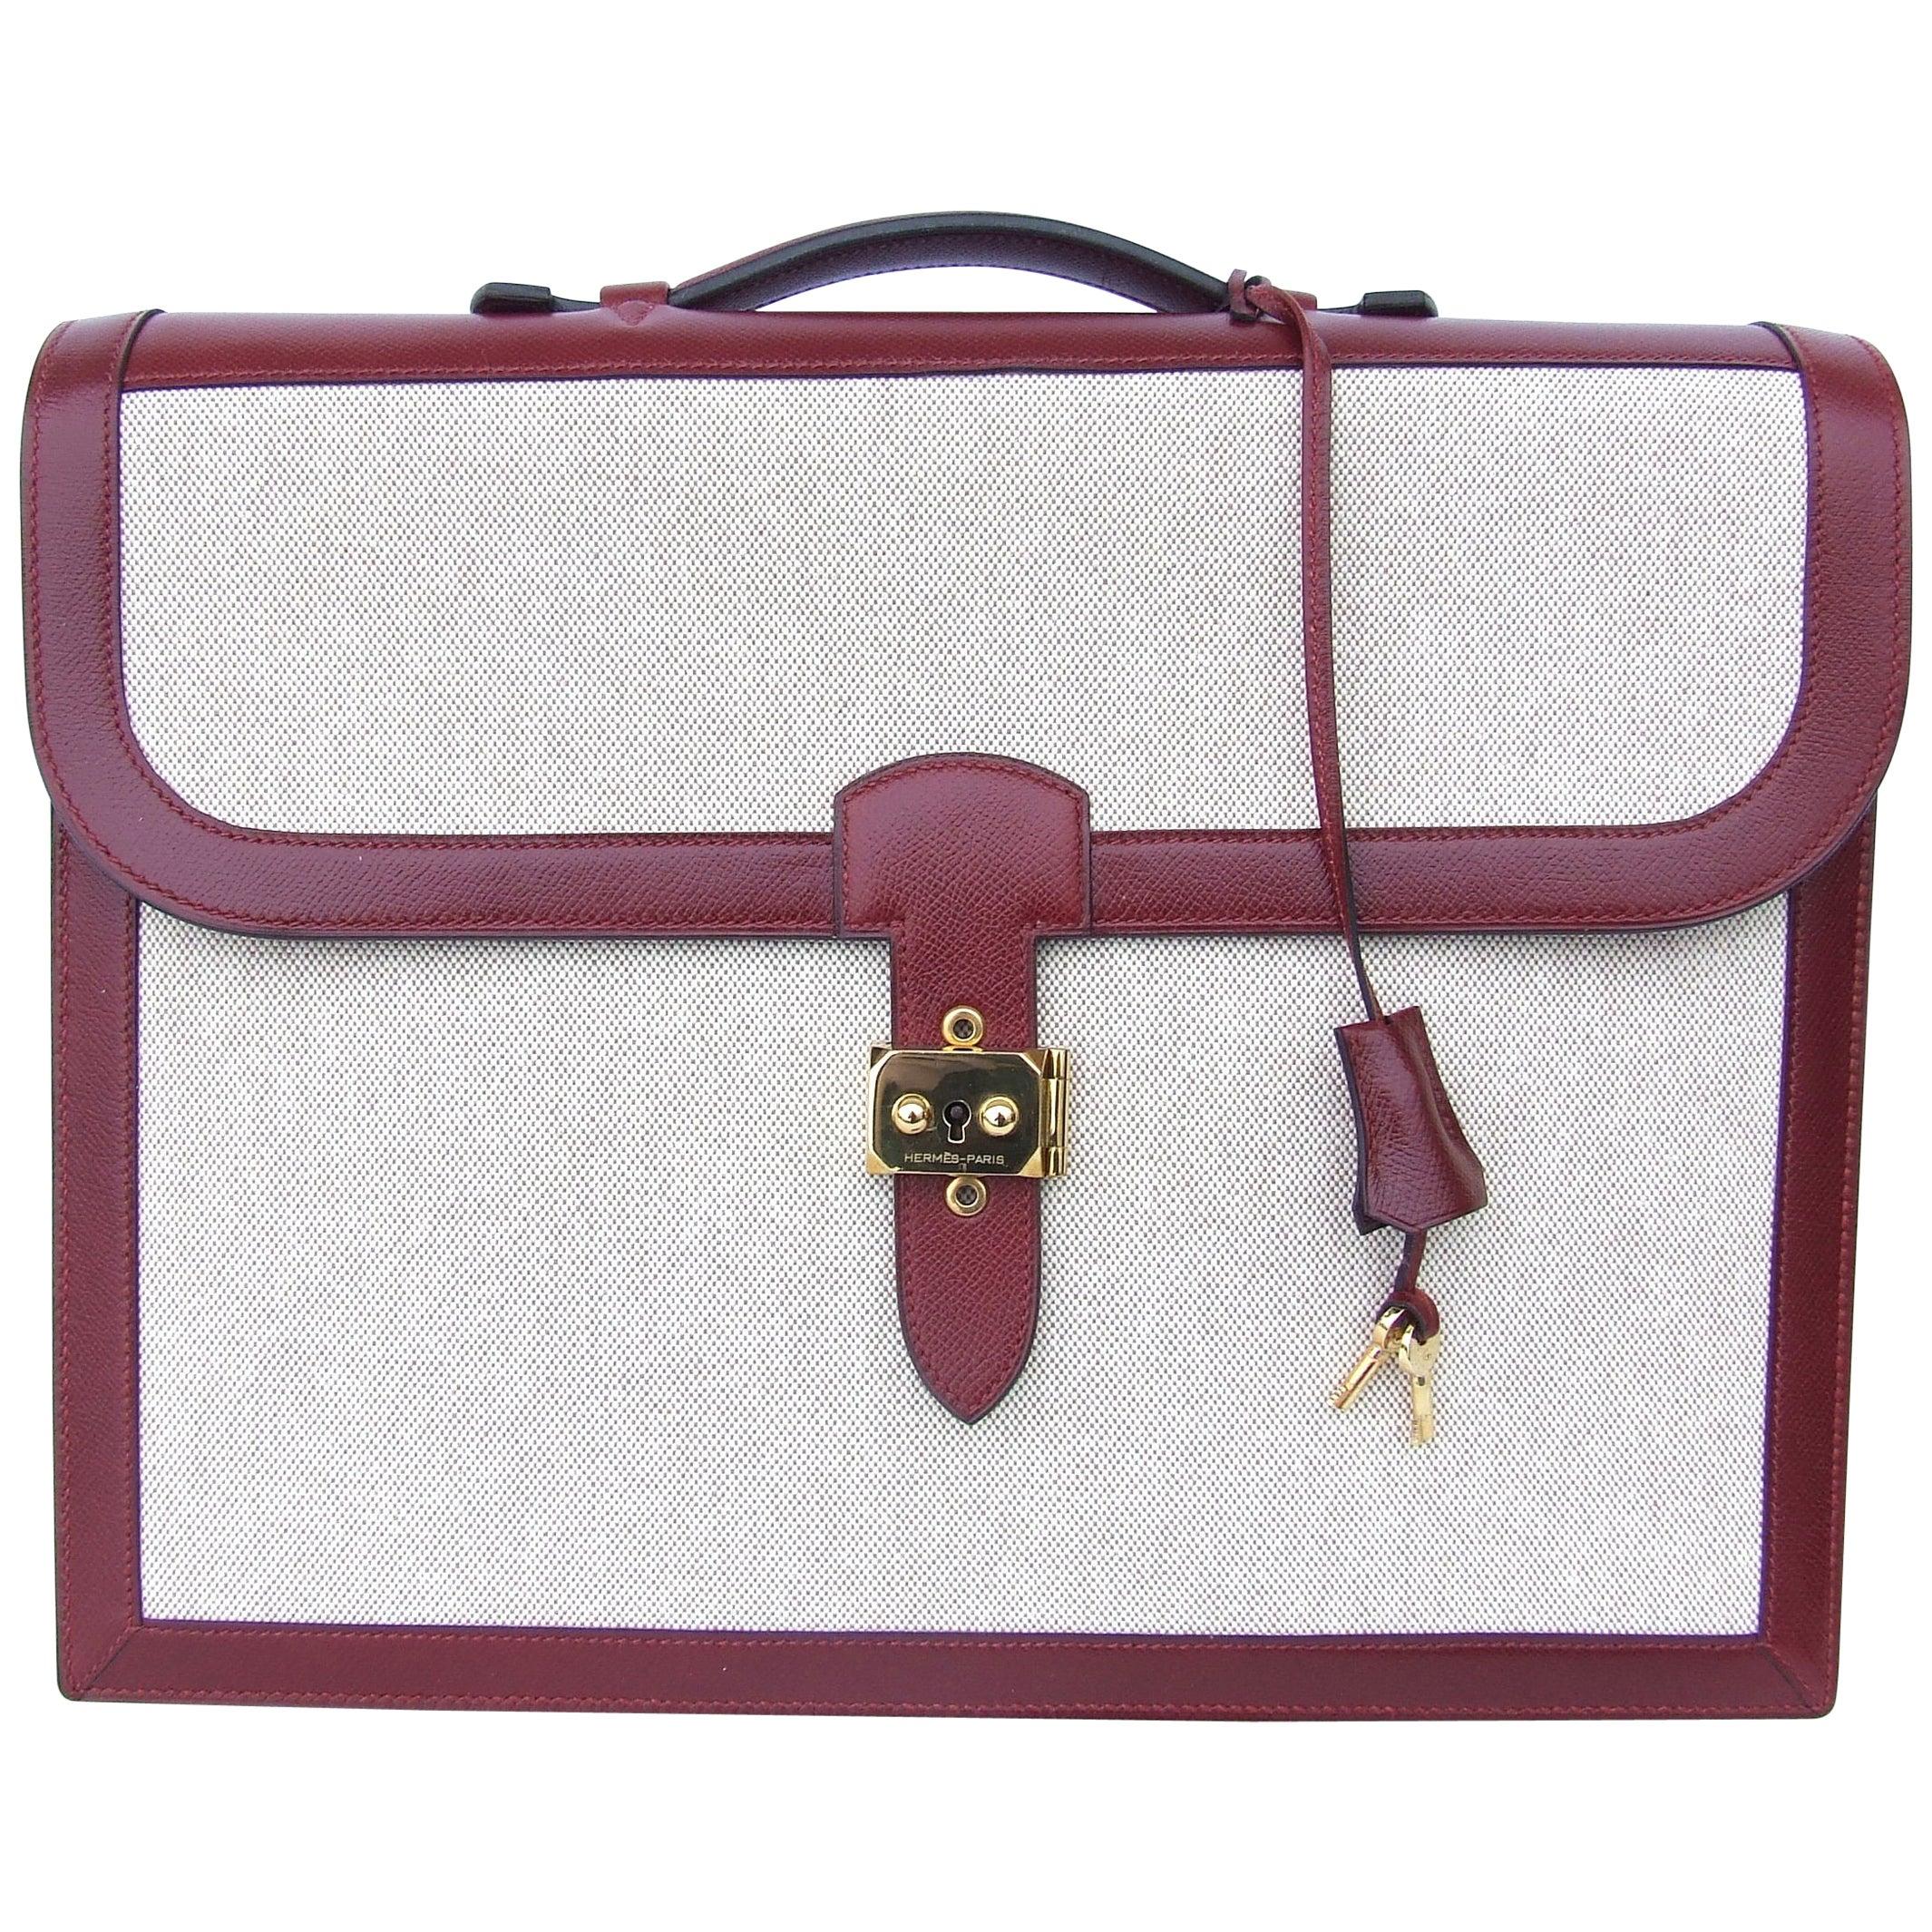 Hermès Toile Canvas 39 cm Red Leather Sac a Depeche Attache Briefcase Handbag